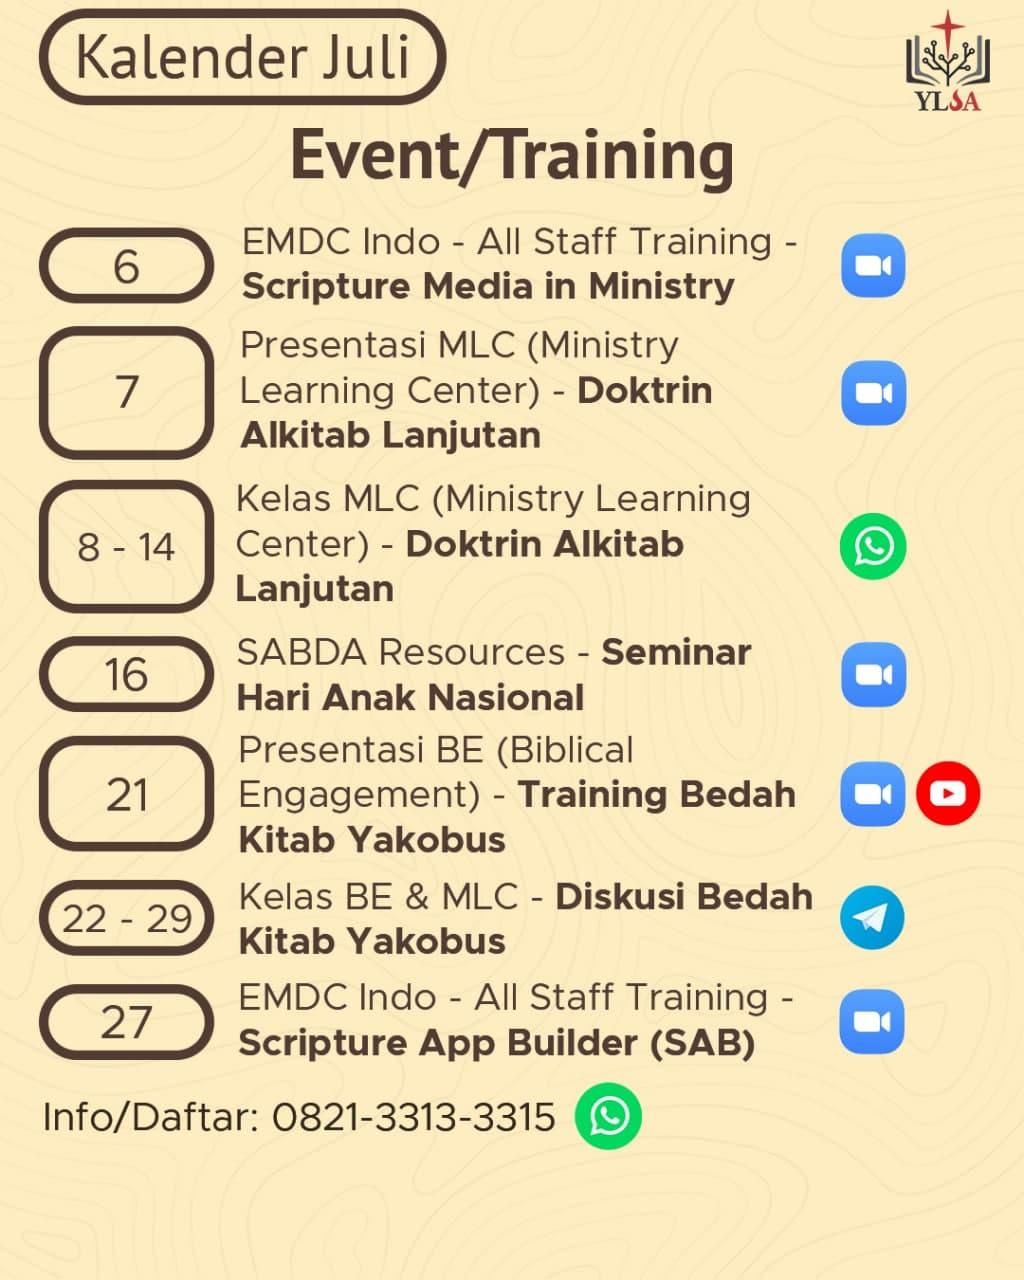 Kalender event/training YLSA selama Juli 2021.